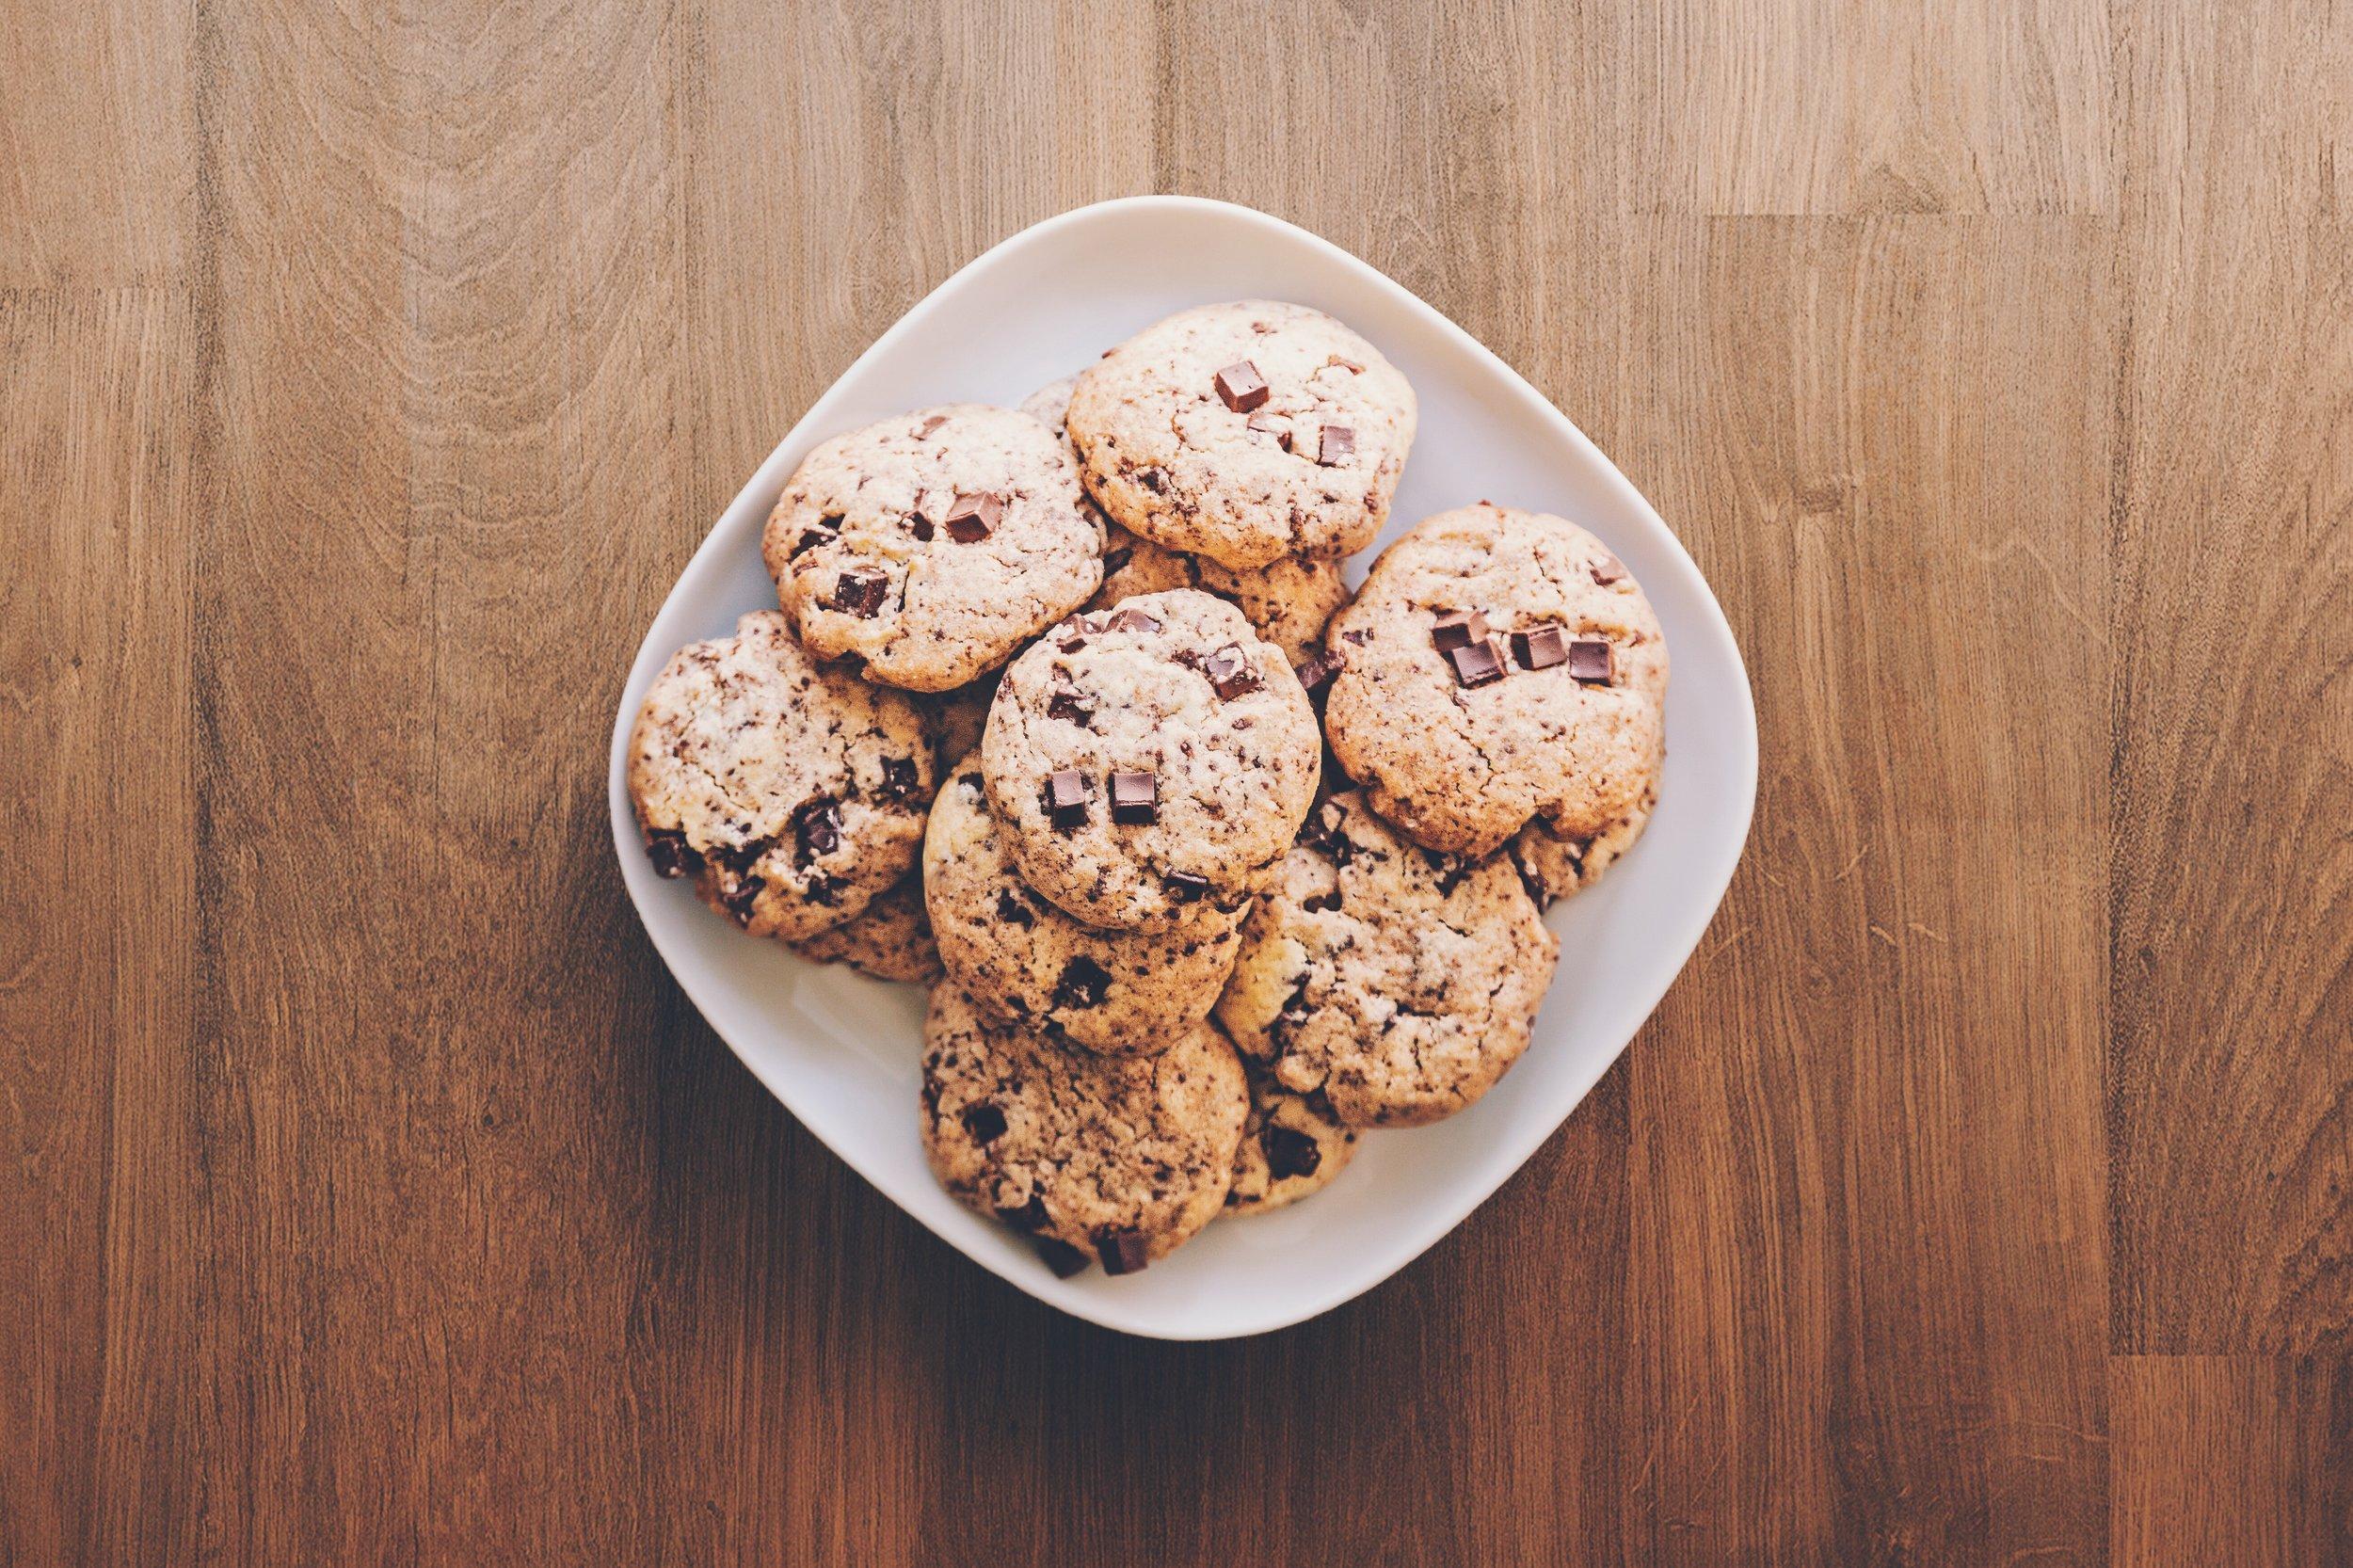 baked-goods-chocolate-chocolate-chip-cookies-890577.jpg